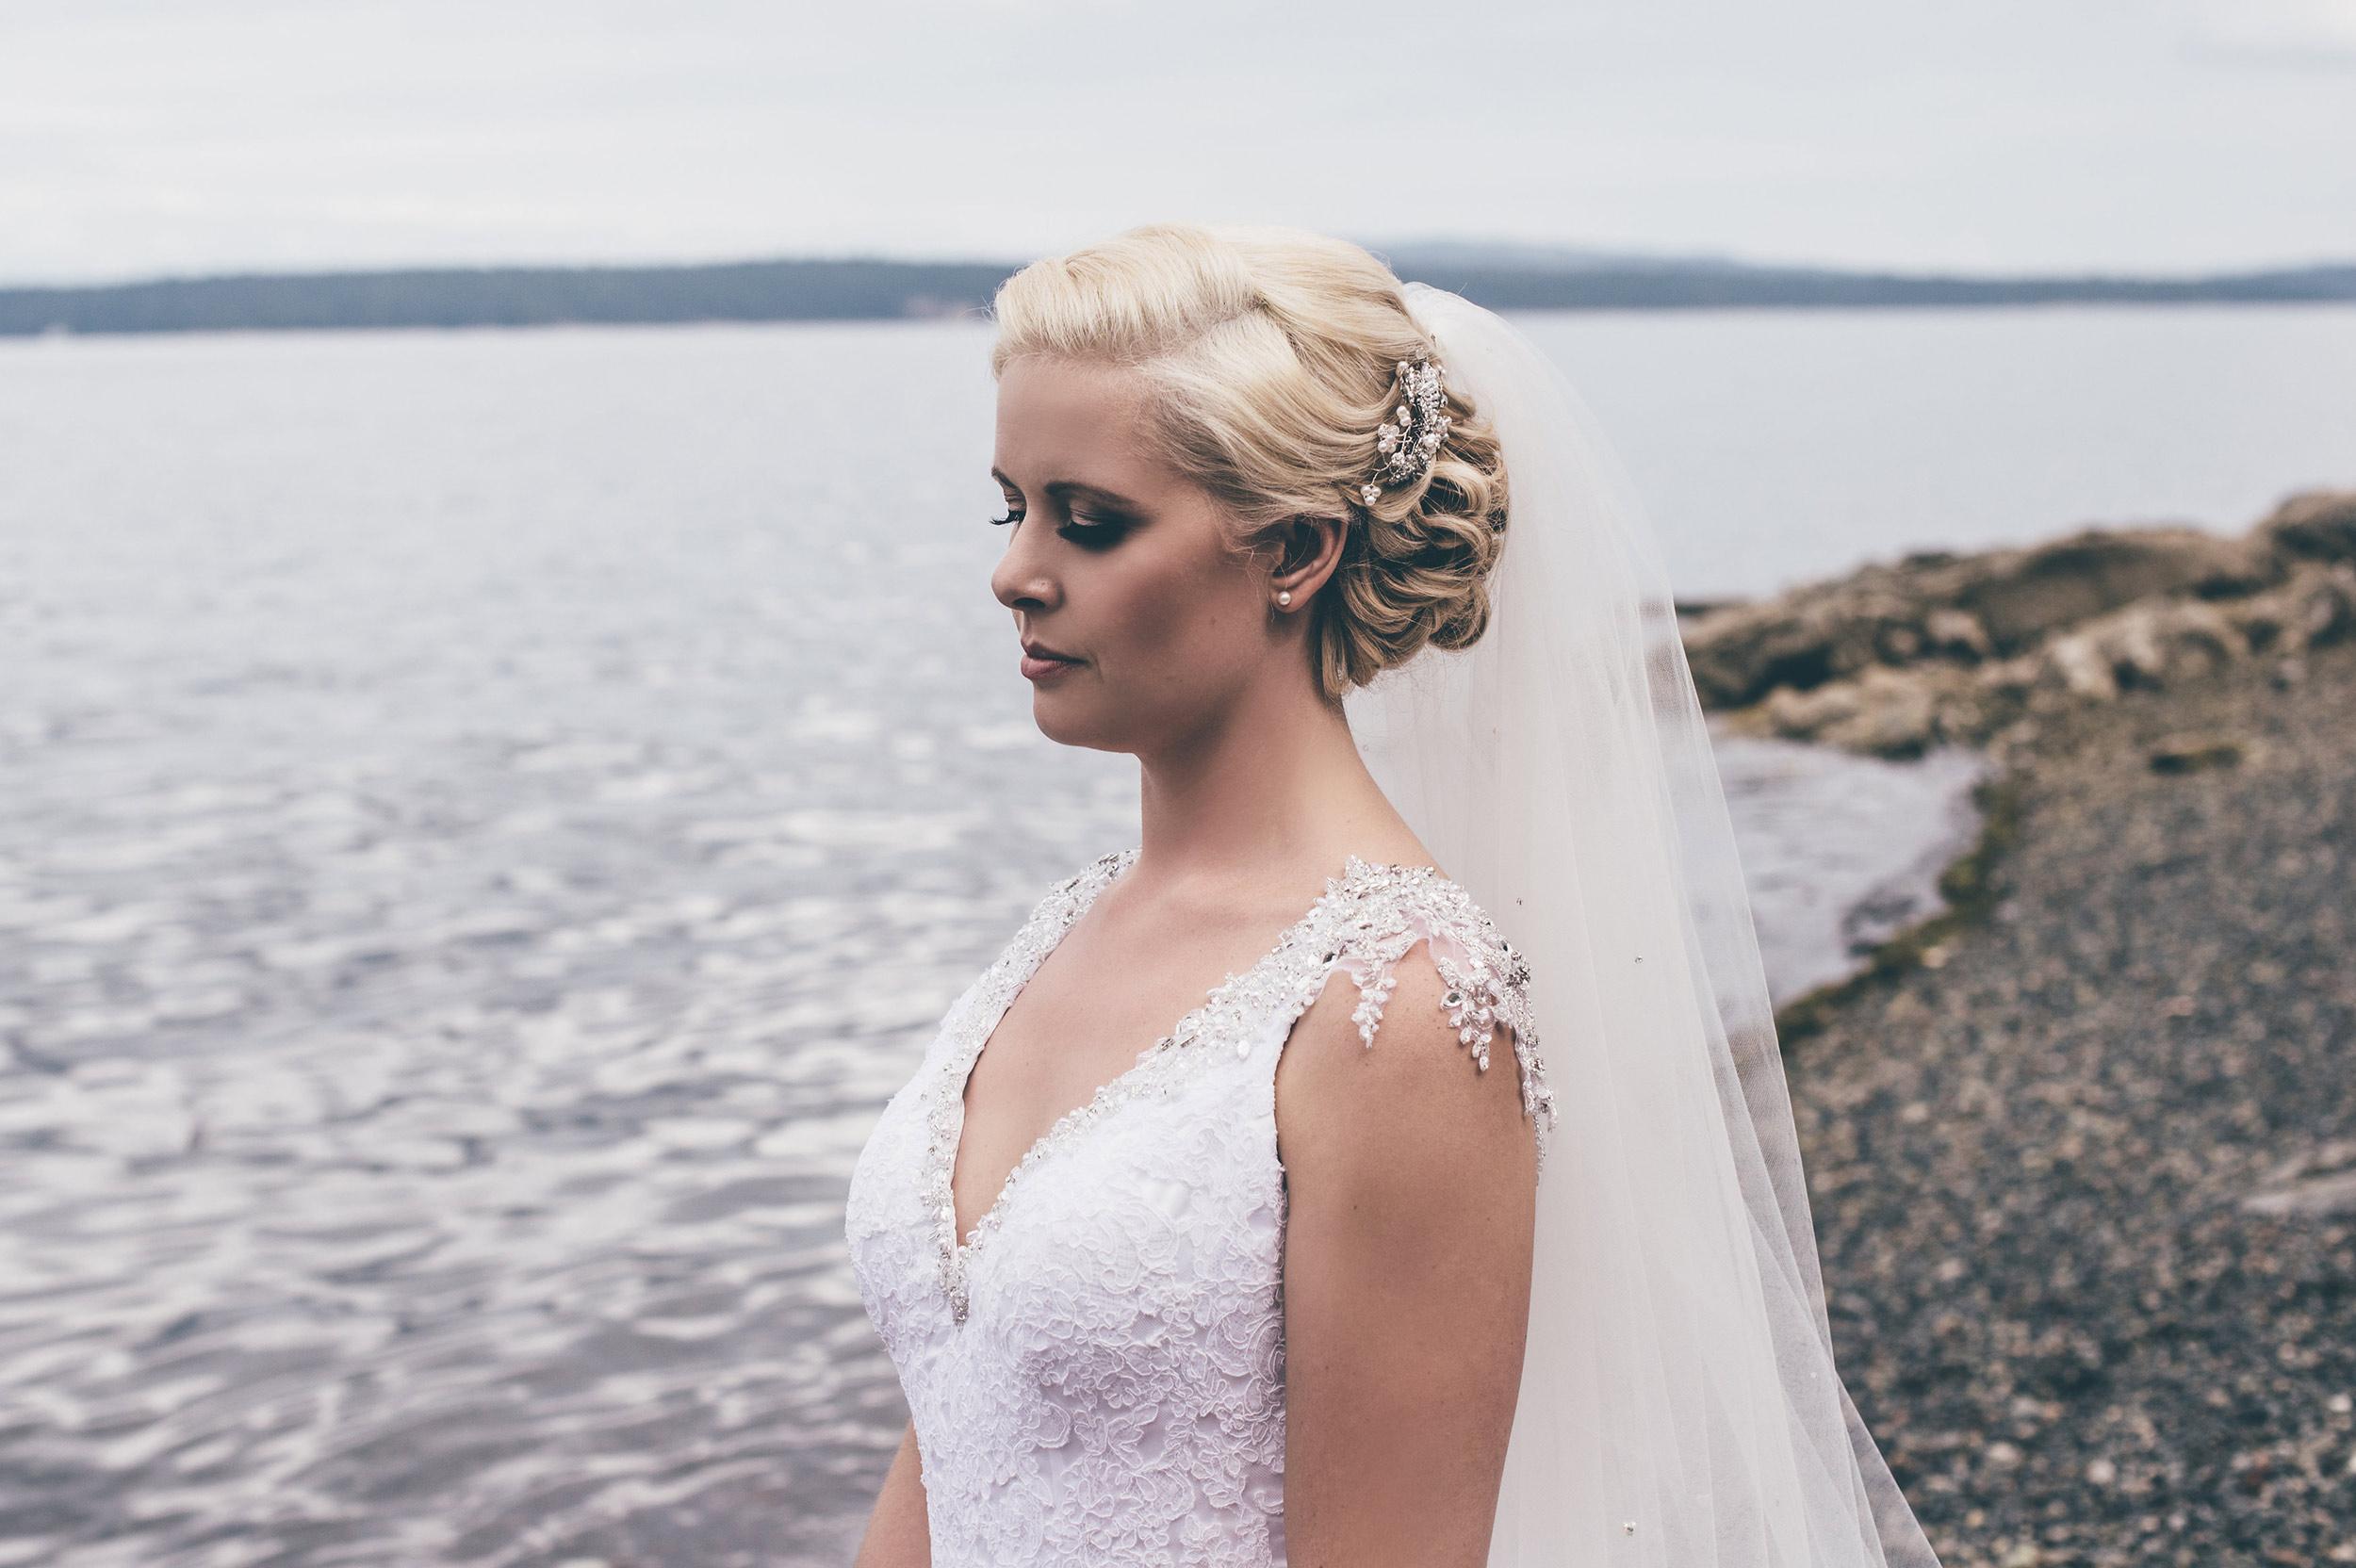 photo by  Amee Nijjar Photography  | hair by Christina Whiteley